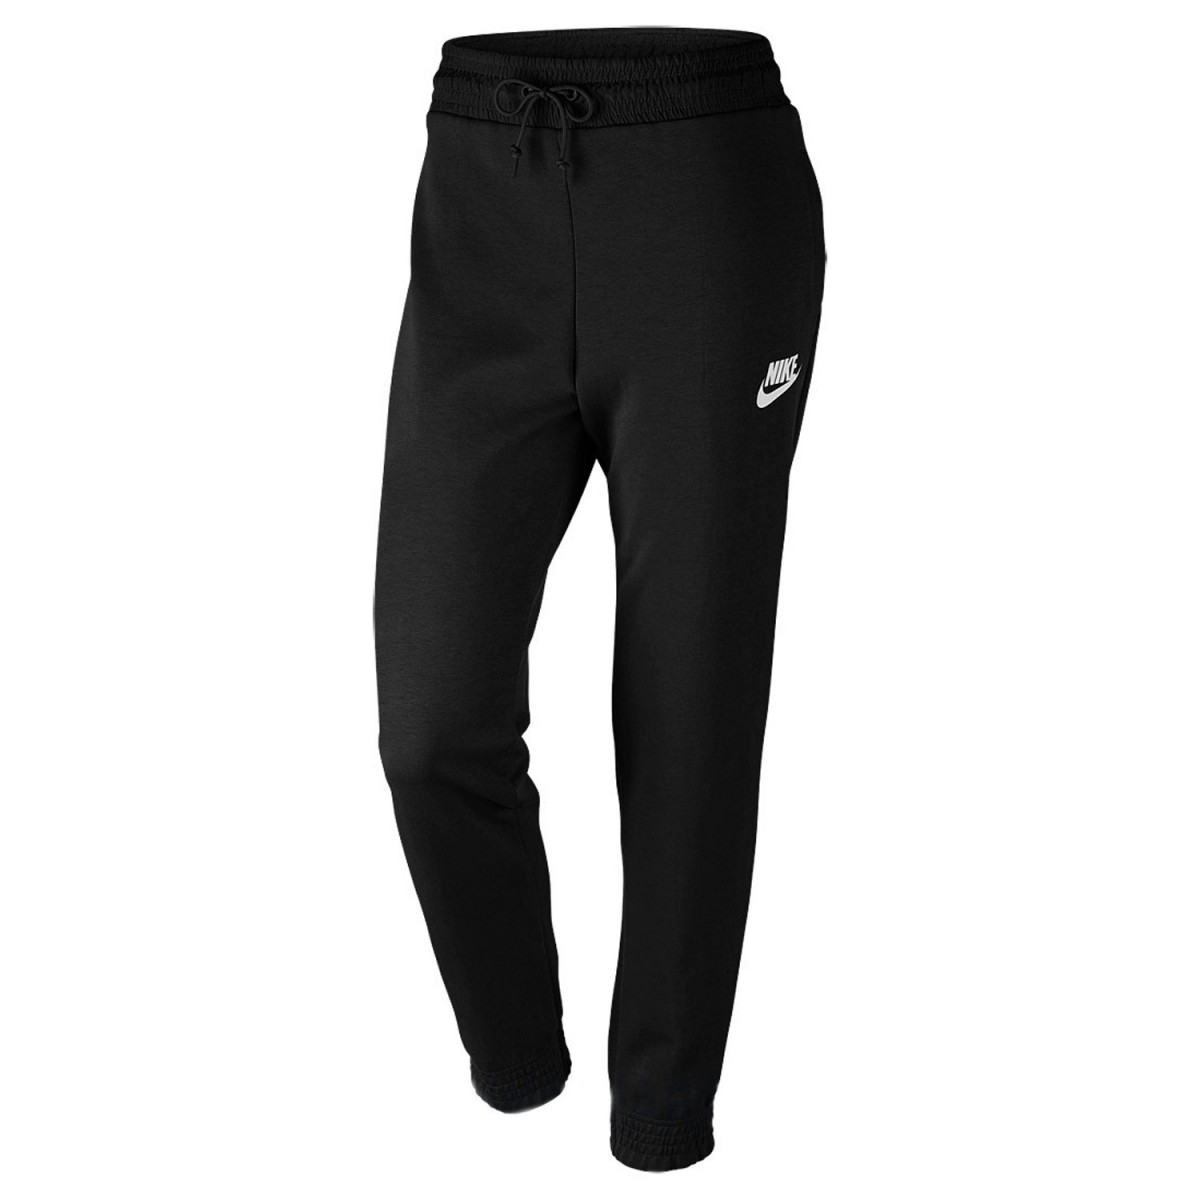 Bizz Store - Calça Feminina Nike AV15 Pant FLC Preta Moletom 05f411adb97